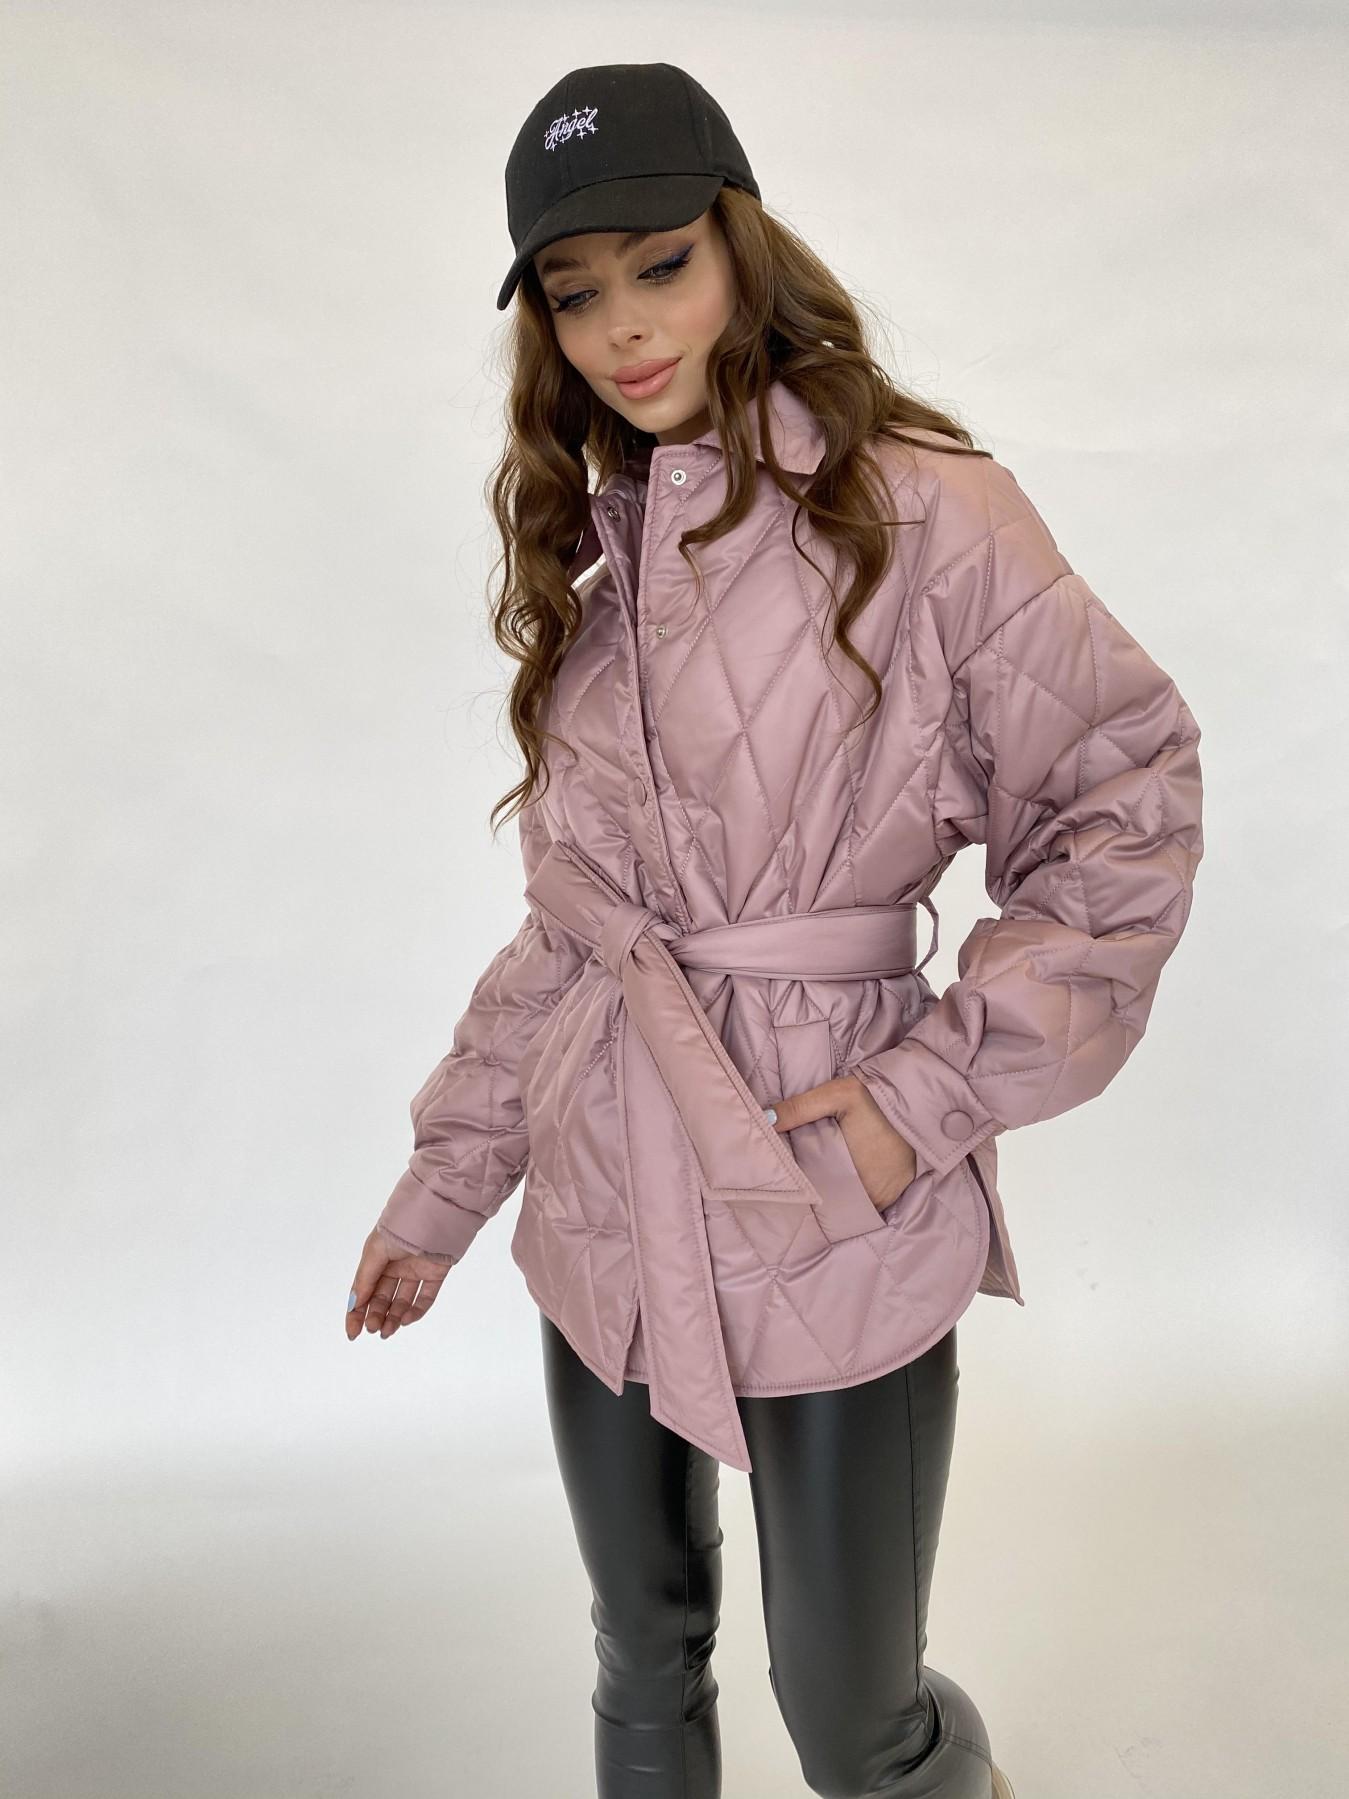 Моно  куртка из плащевой ткани Gloria 11081 АРТ. 47647 Цвет: Пудра - фото 4, интернет магазин tm-modus.ru